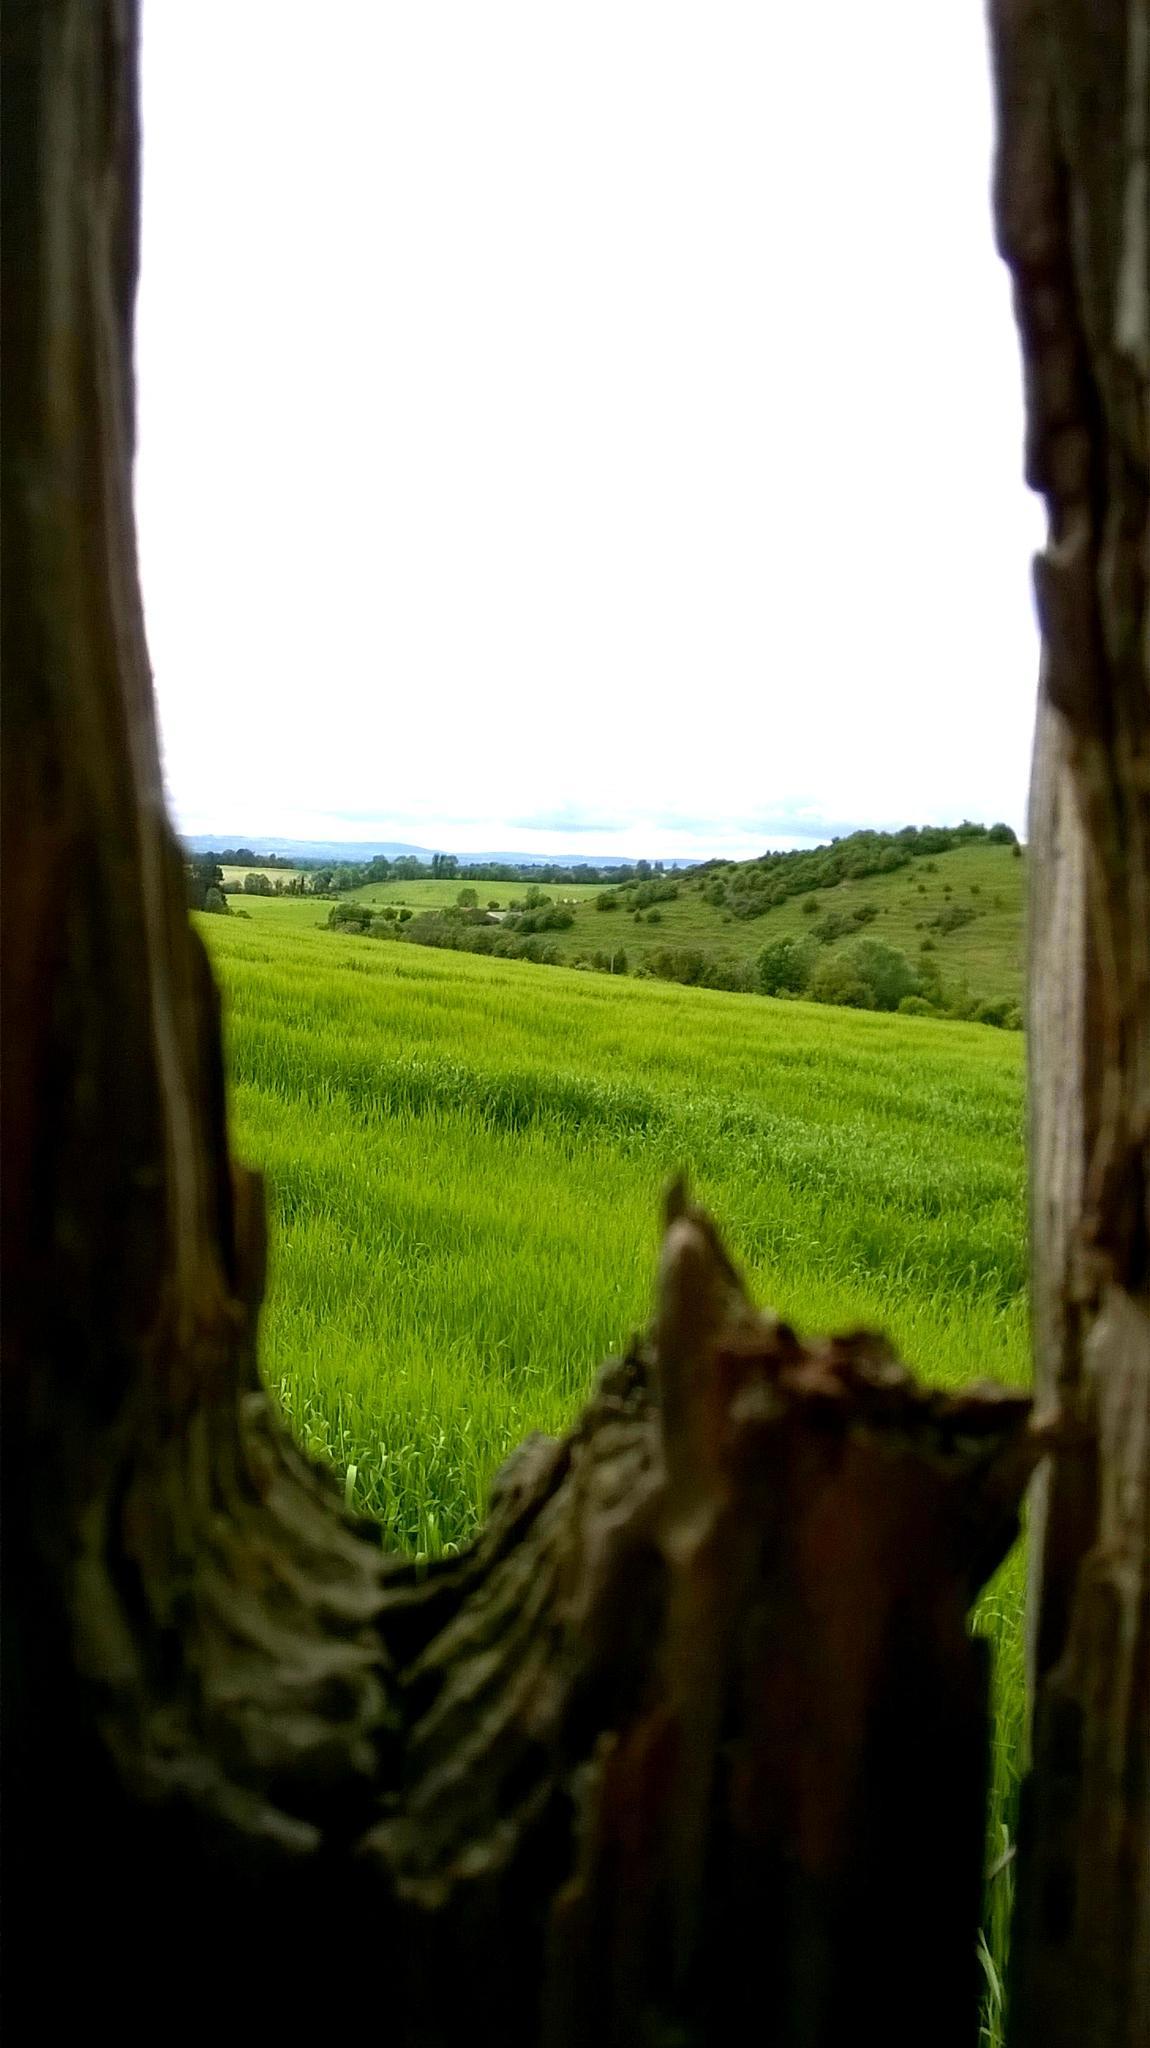 Fields of Barley by Eugene Brennan